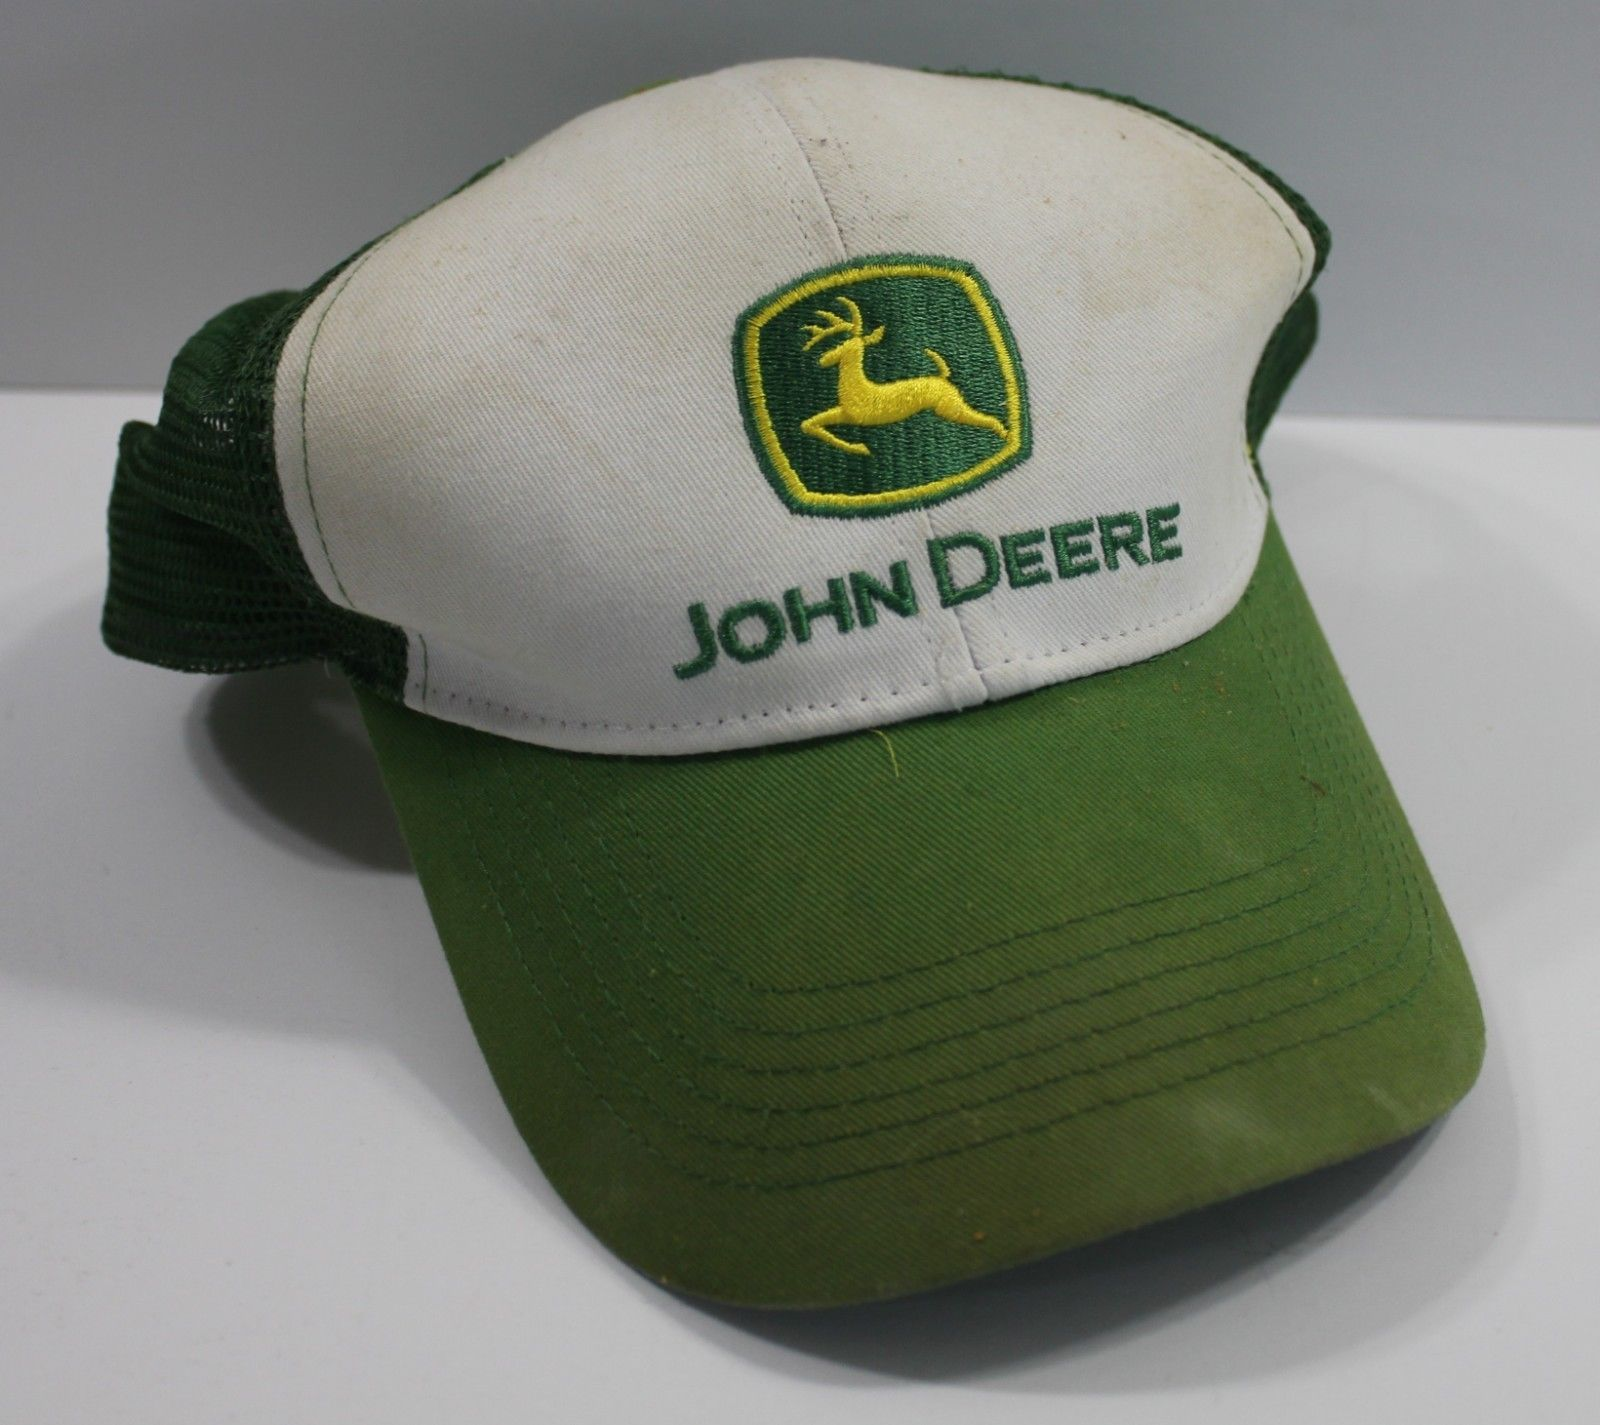 7b946599e5a93 Vintage Trucker Hat John Deere Mesh Snapback and 50 similar items. 57